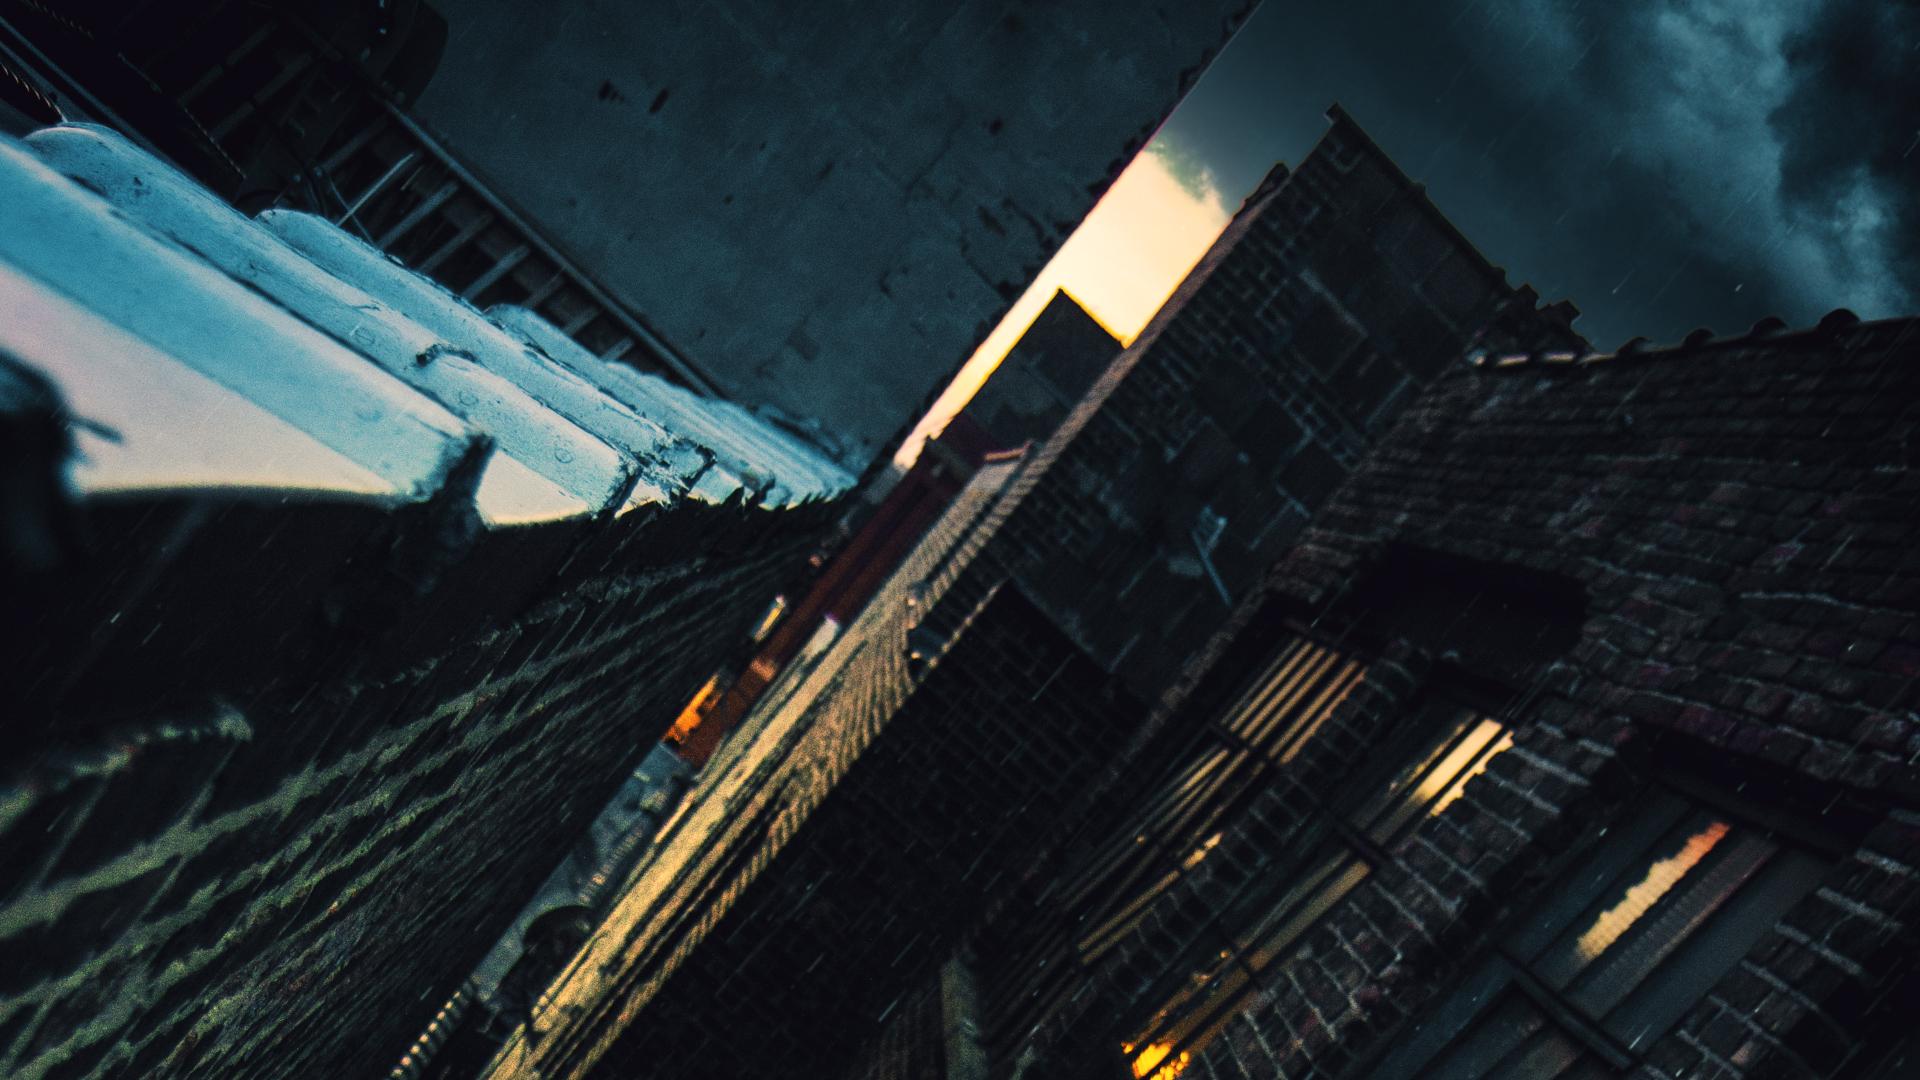 RAINDOG_FILMS_BOARD_02 (00000).jpg